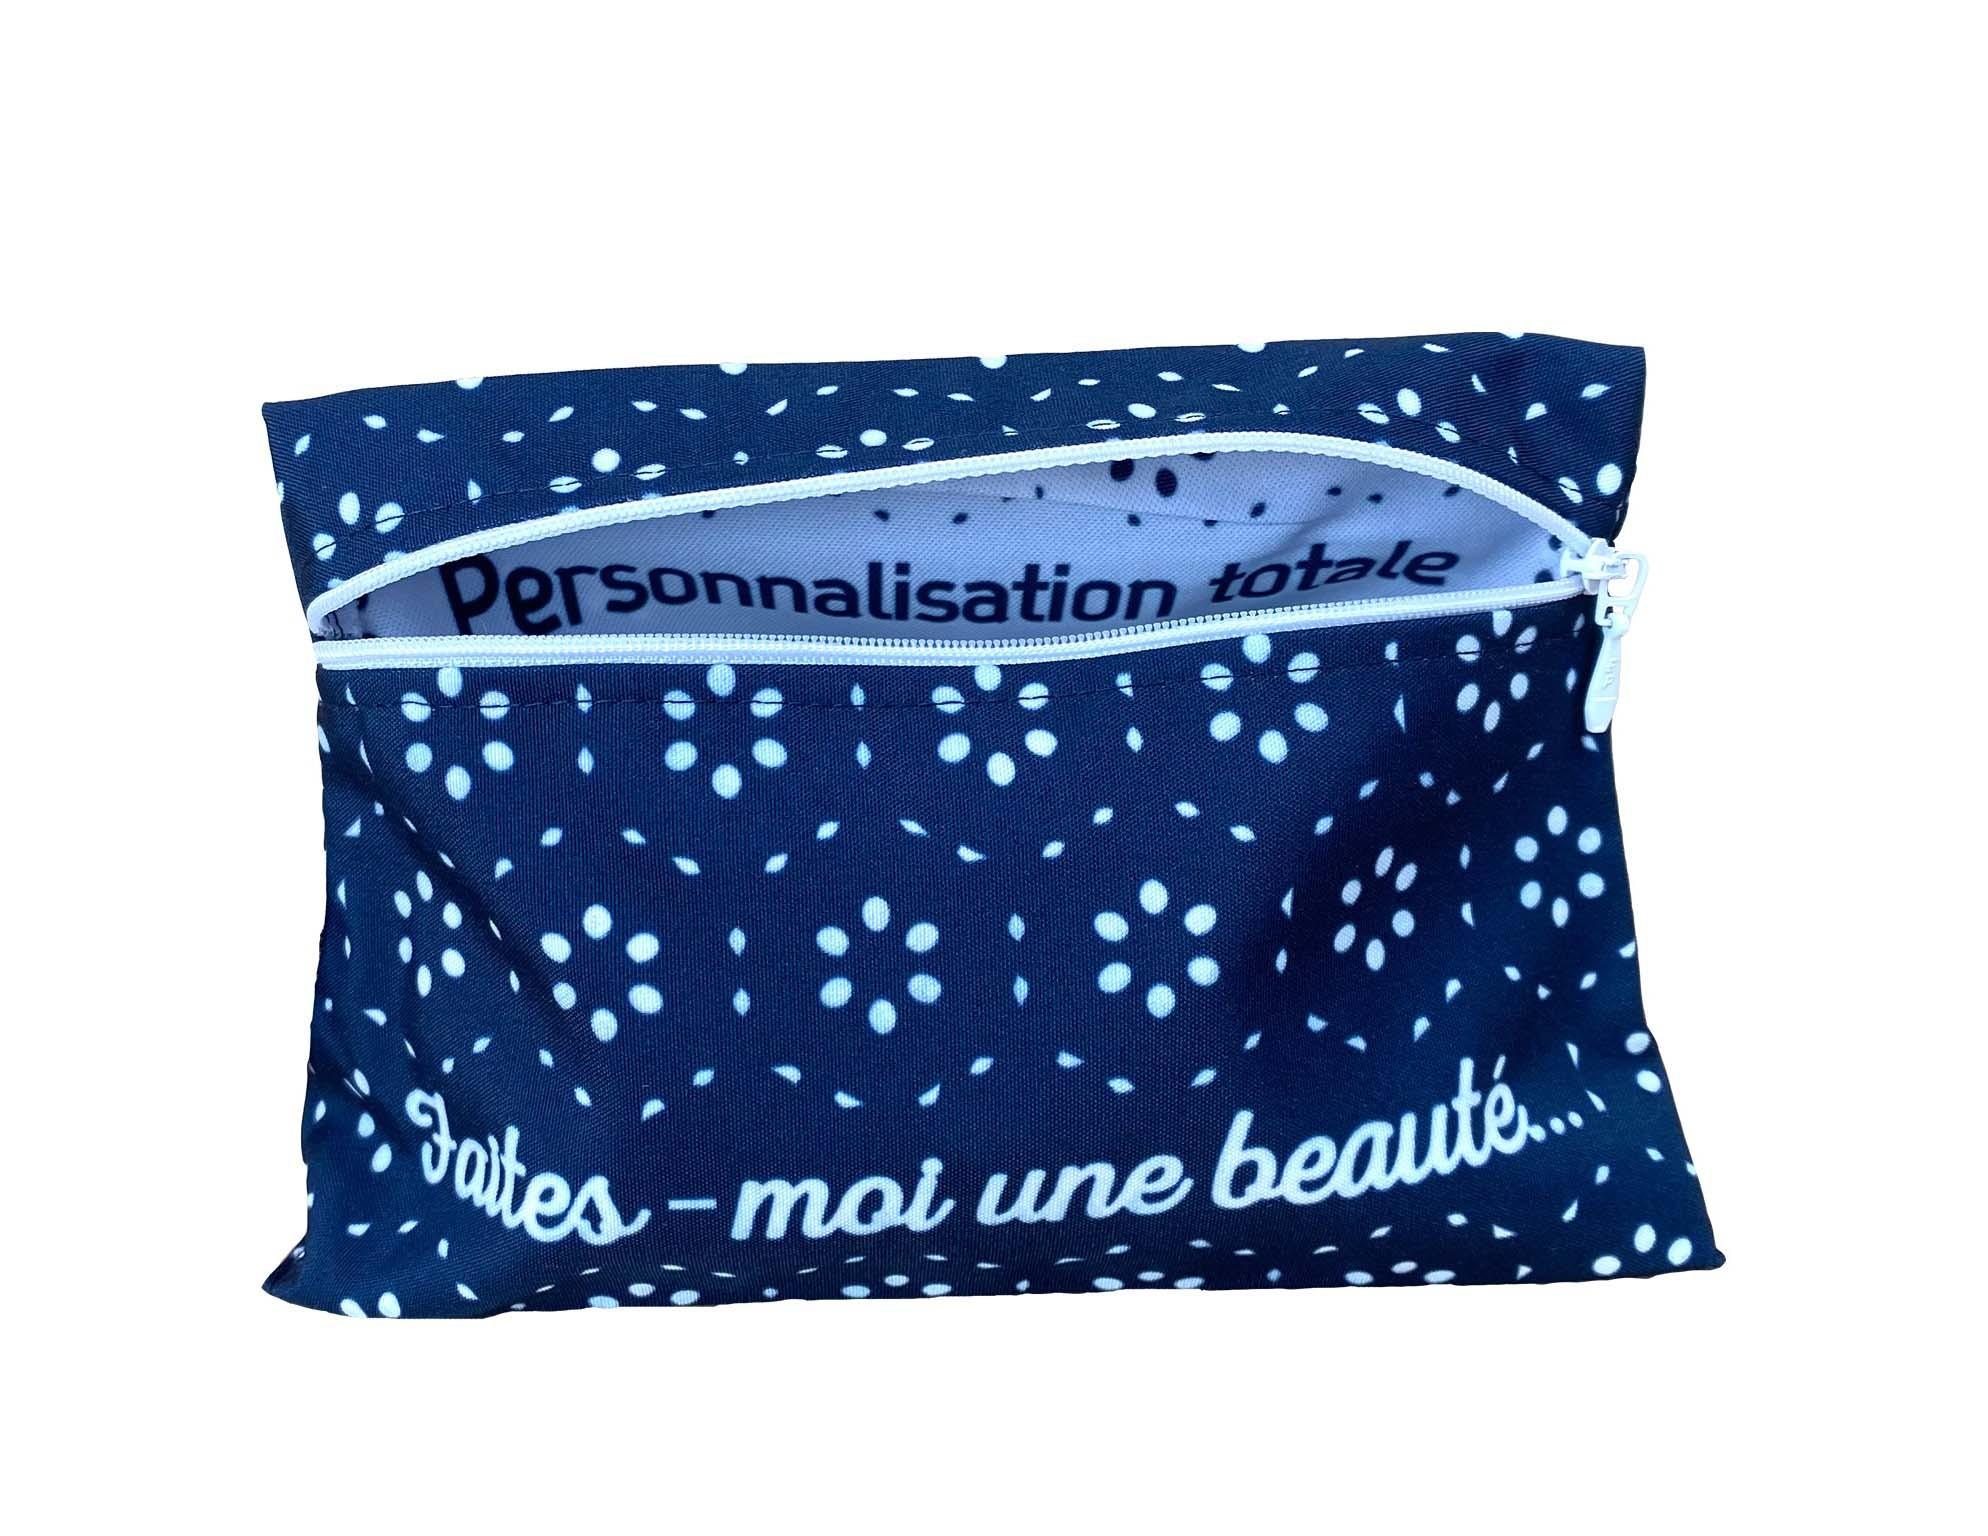 Beauty doublée